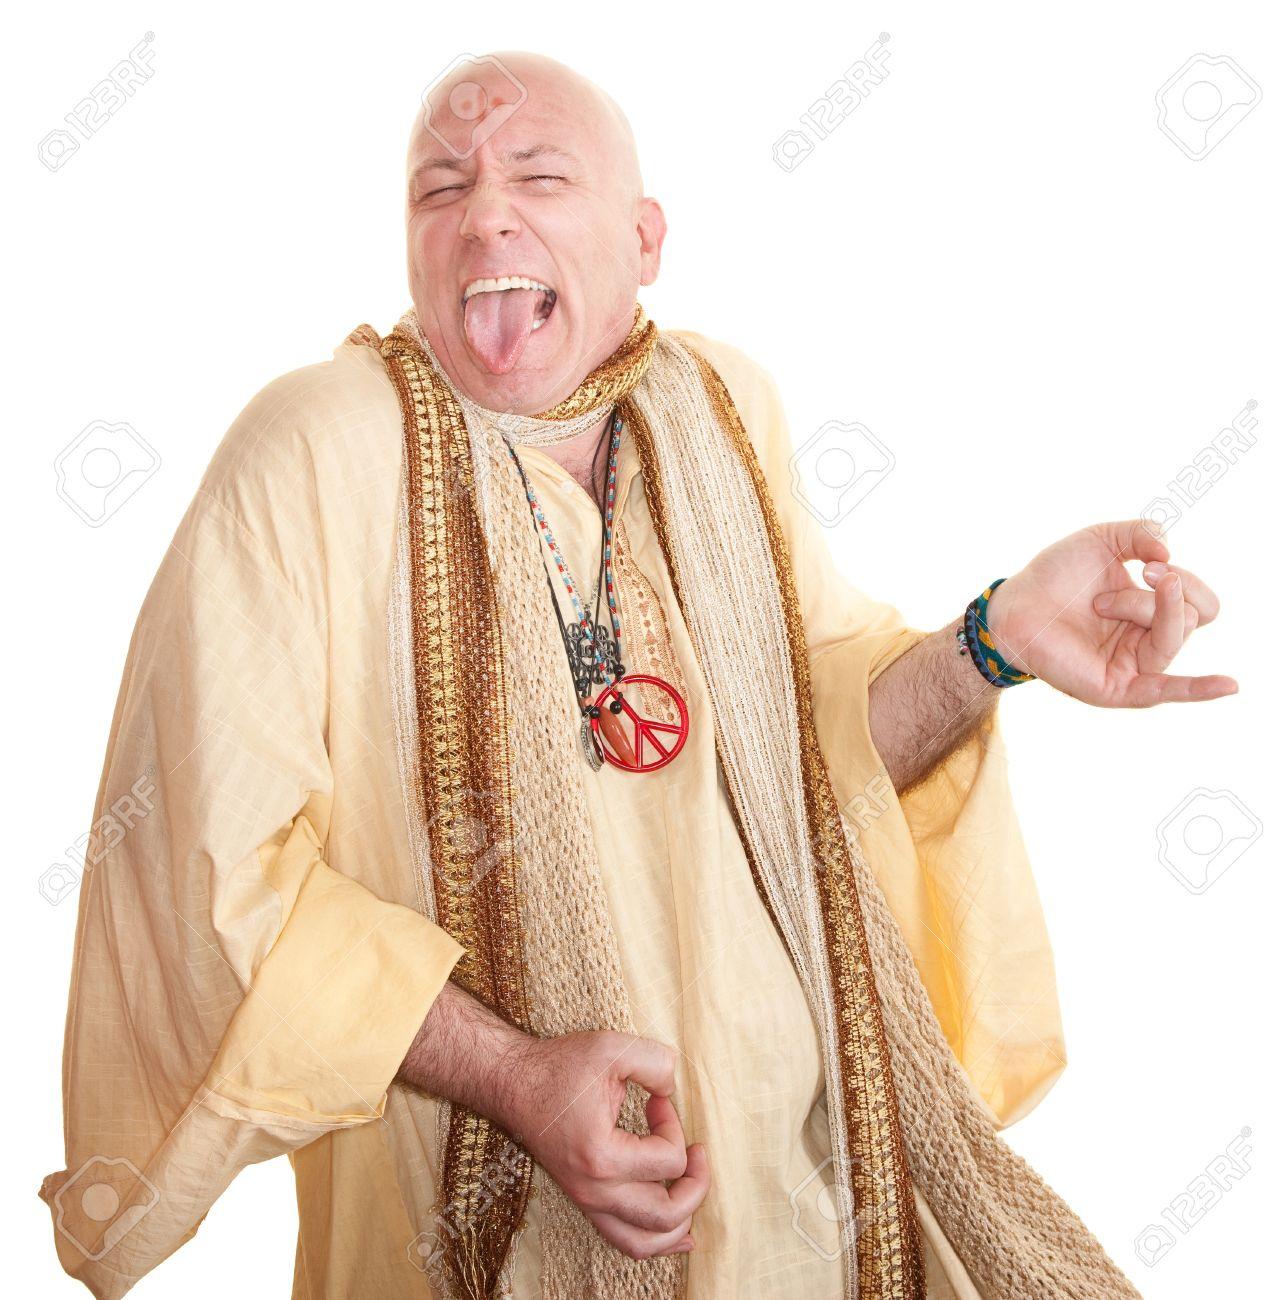 Crazy bald guru plays air guitar over white background Stock Photo - 10553256